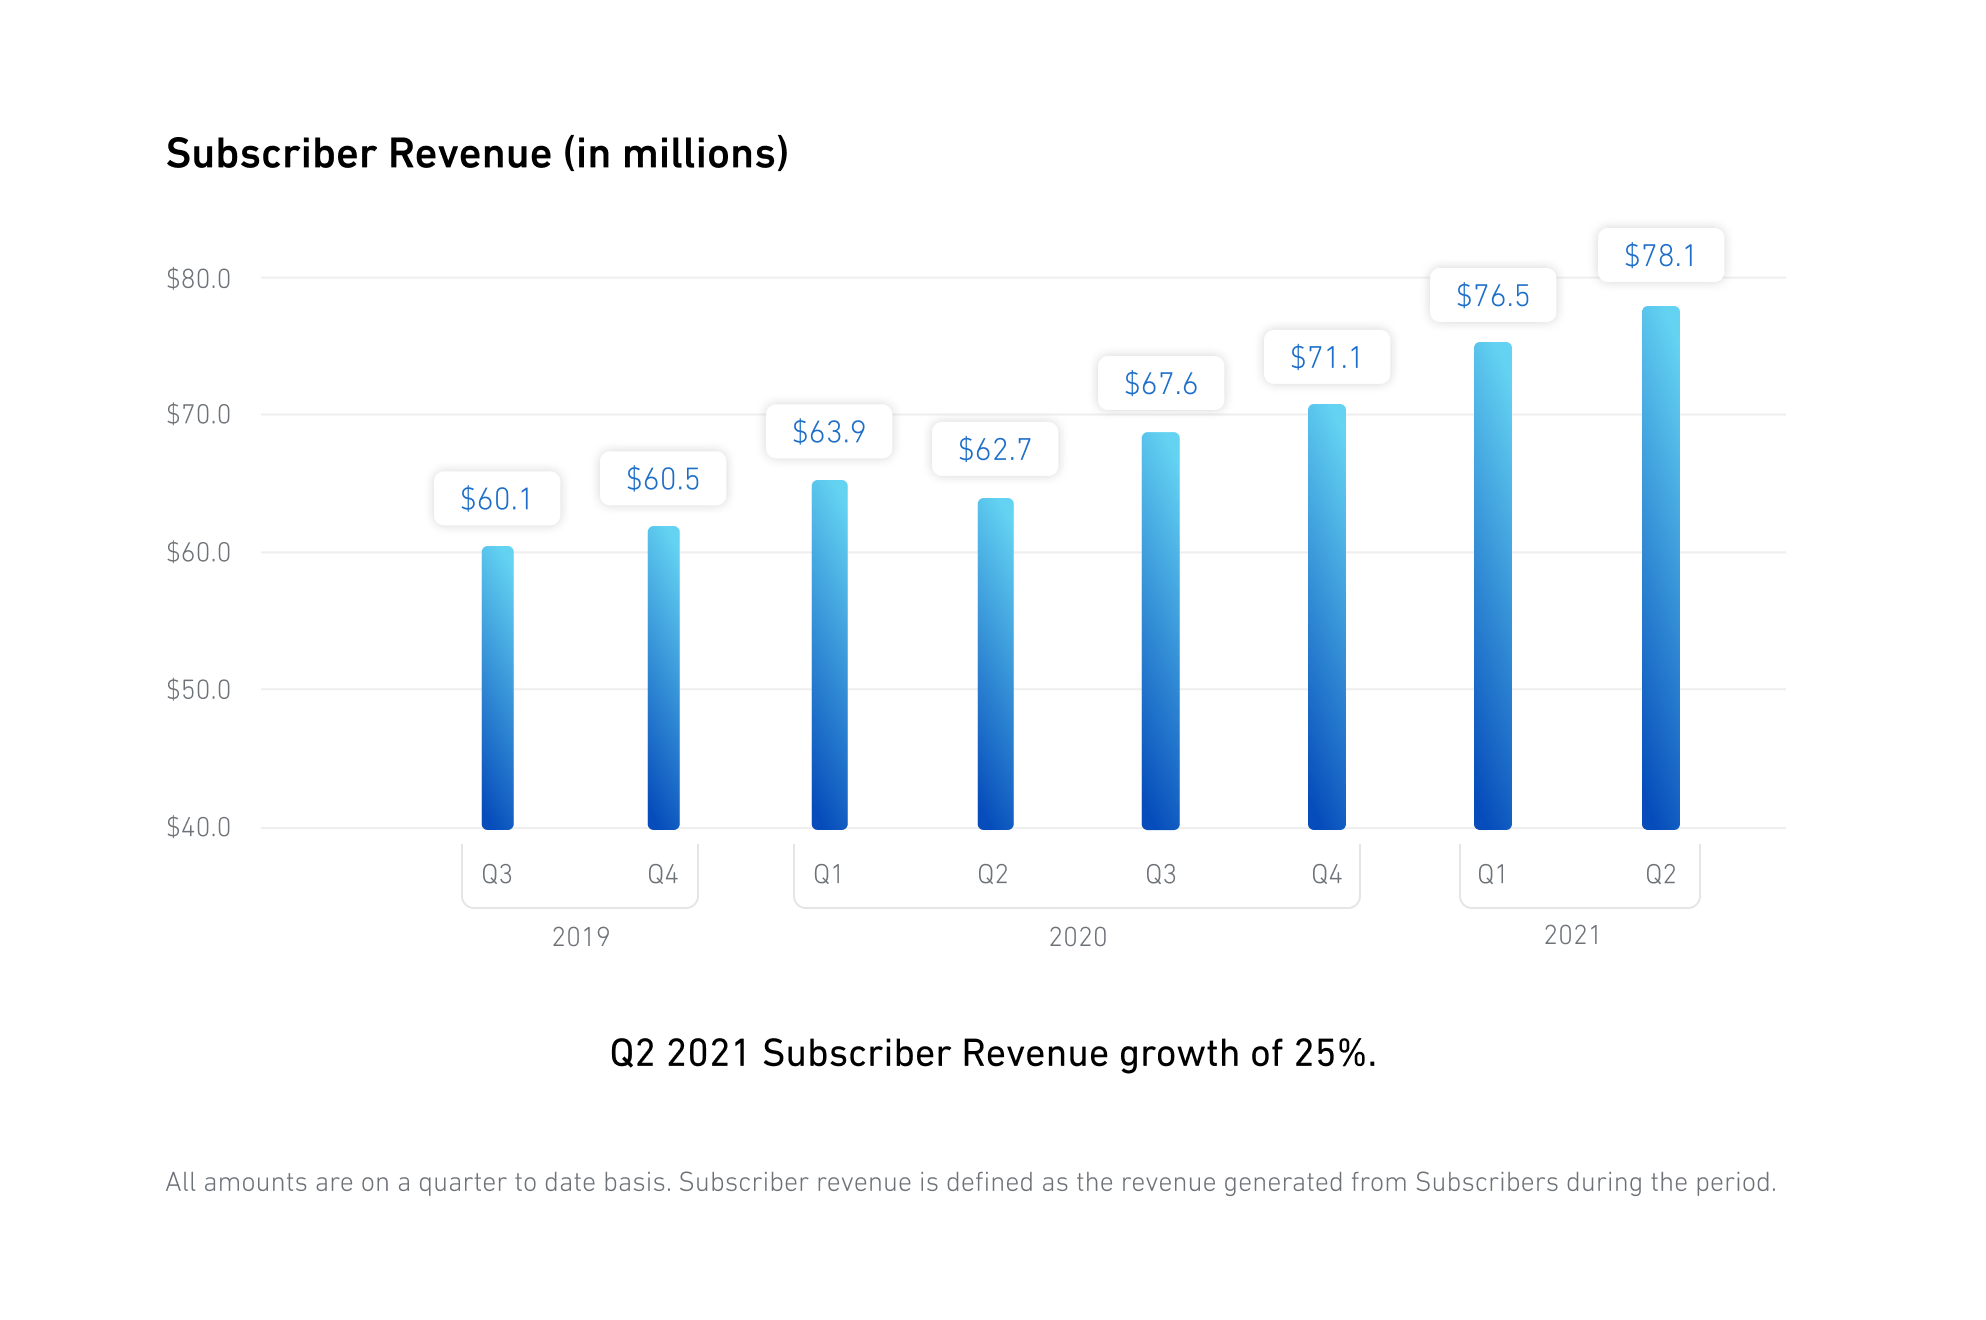 Subscriber Revenue (in millions)